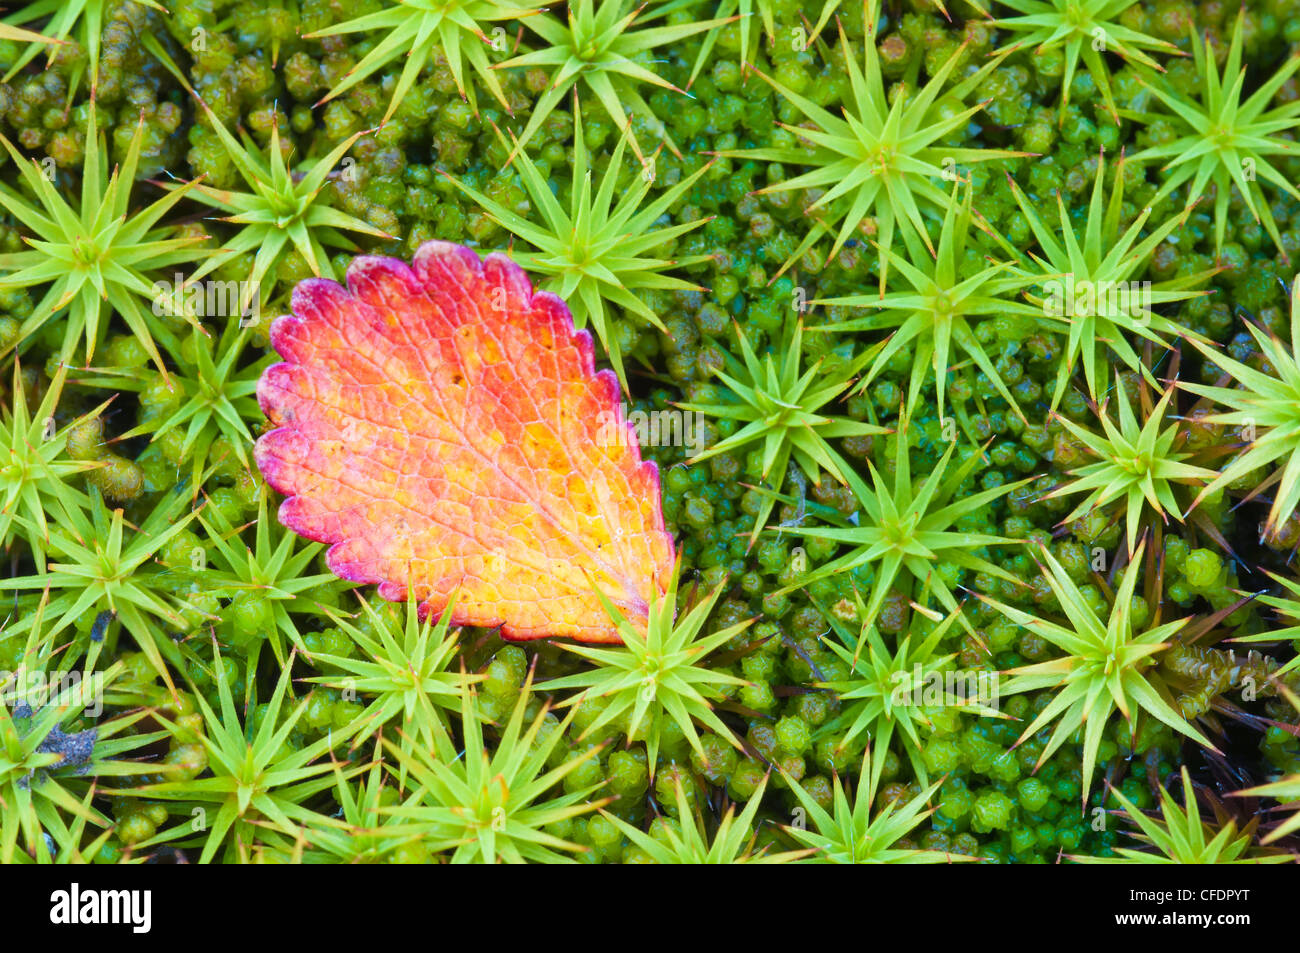 Dwarf birch (Betula glandulosa) on arctic moss, Barrenlands, centrral Northwest Territories, Arctic Canada - Stock Image